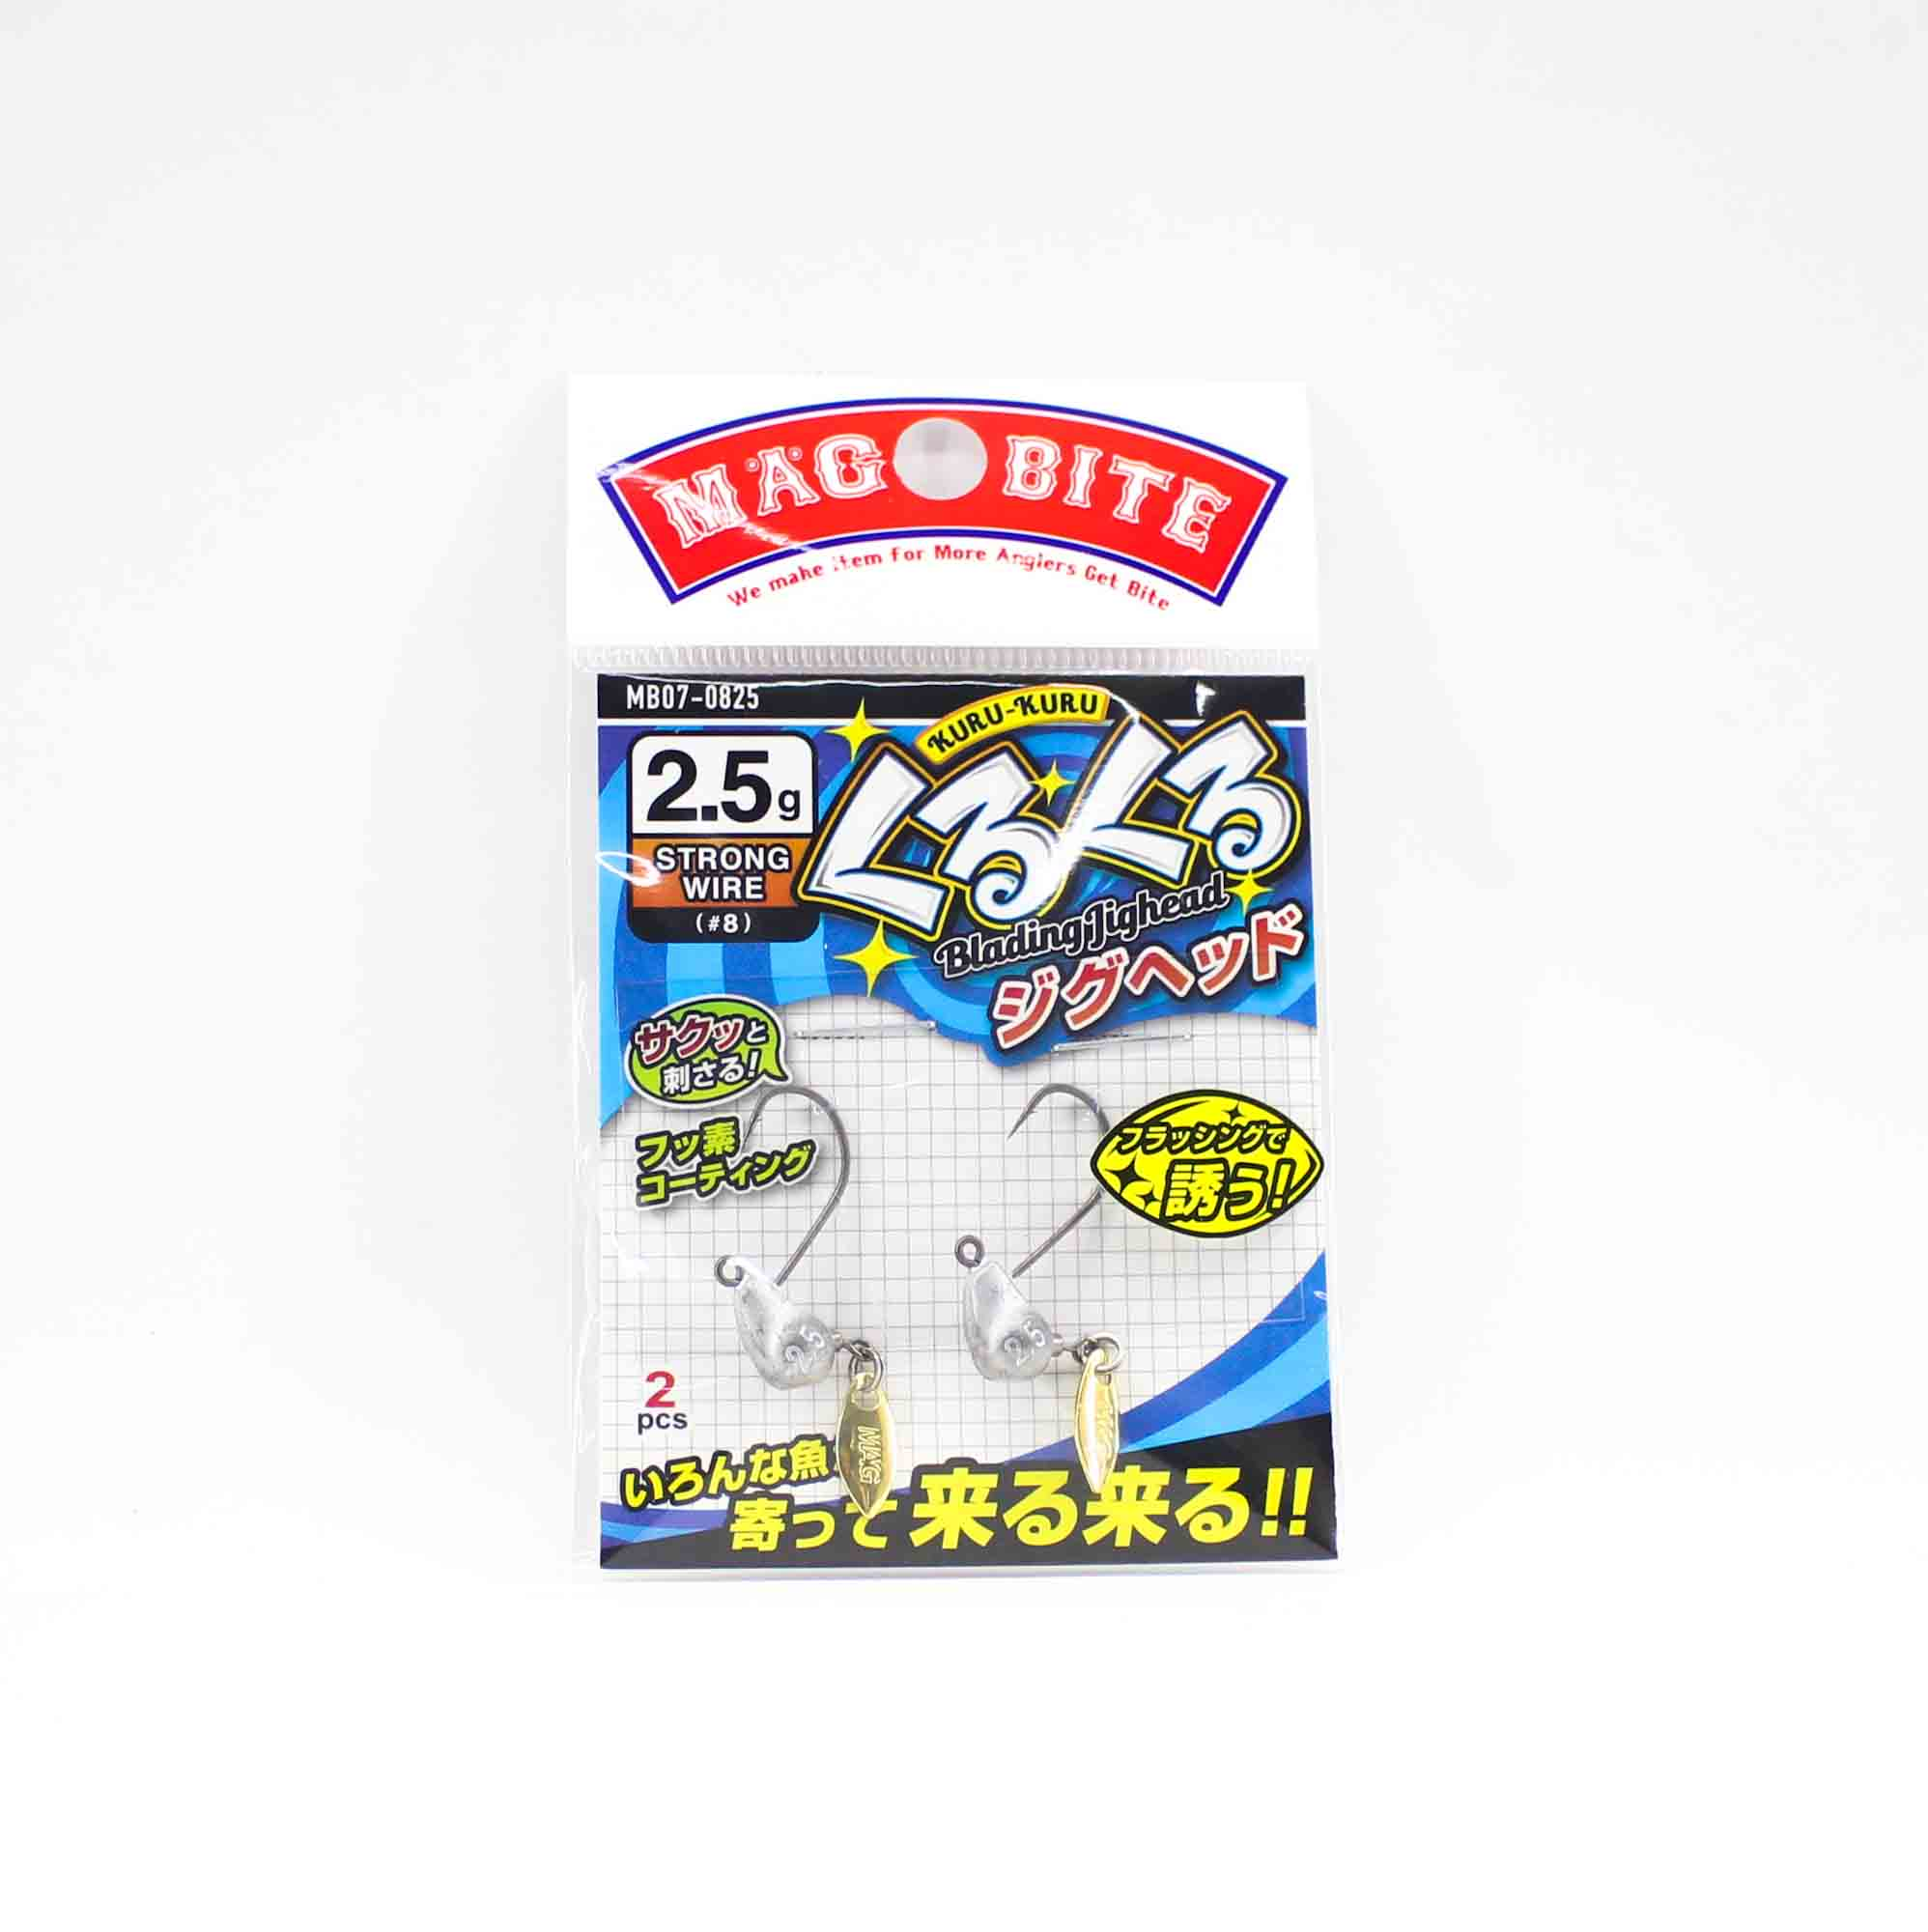 Harimitsu Mag bite Jighead KuruKuru Blading 2.5 grams size 8 (7062)